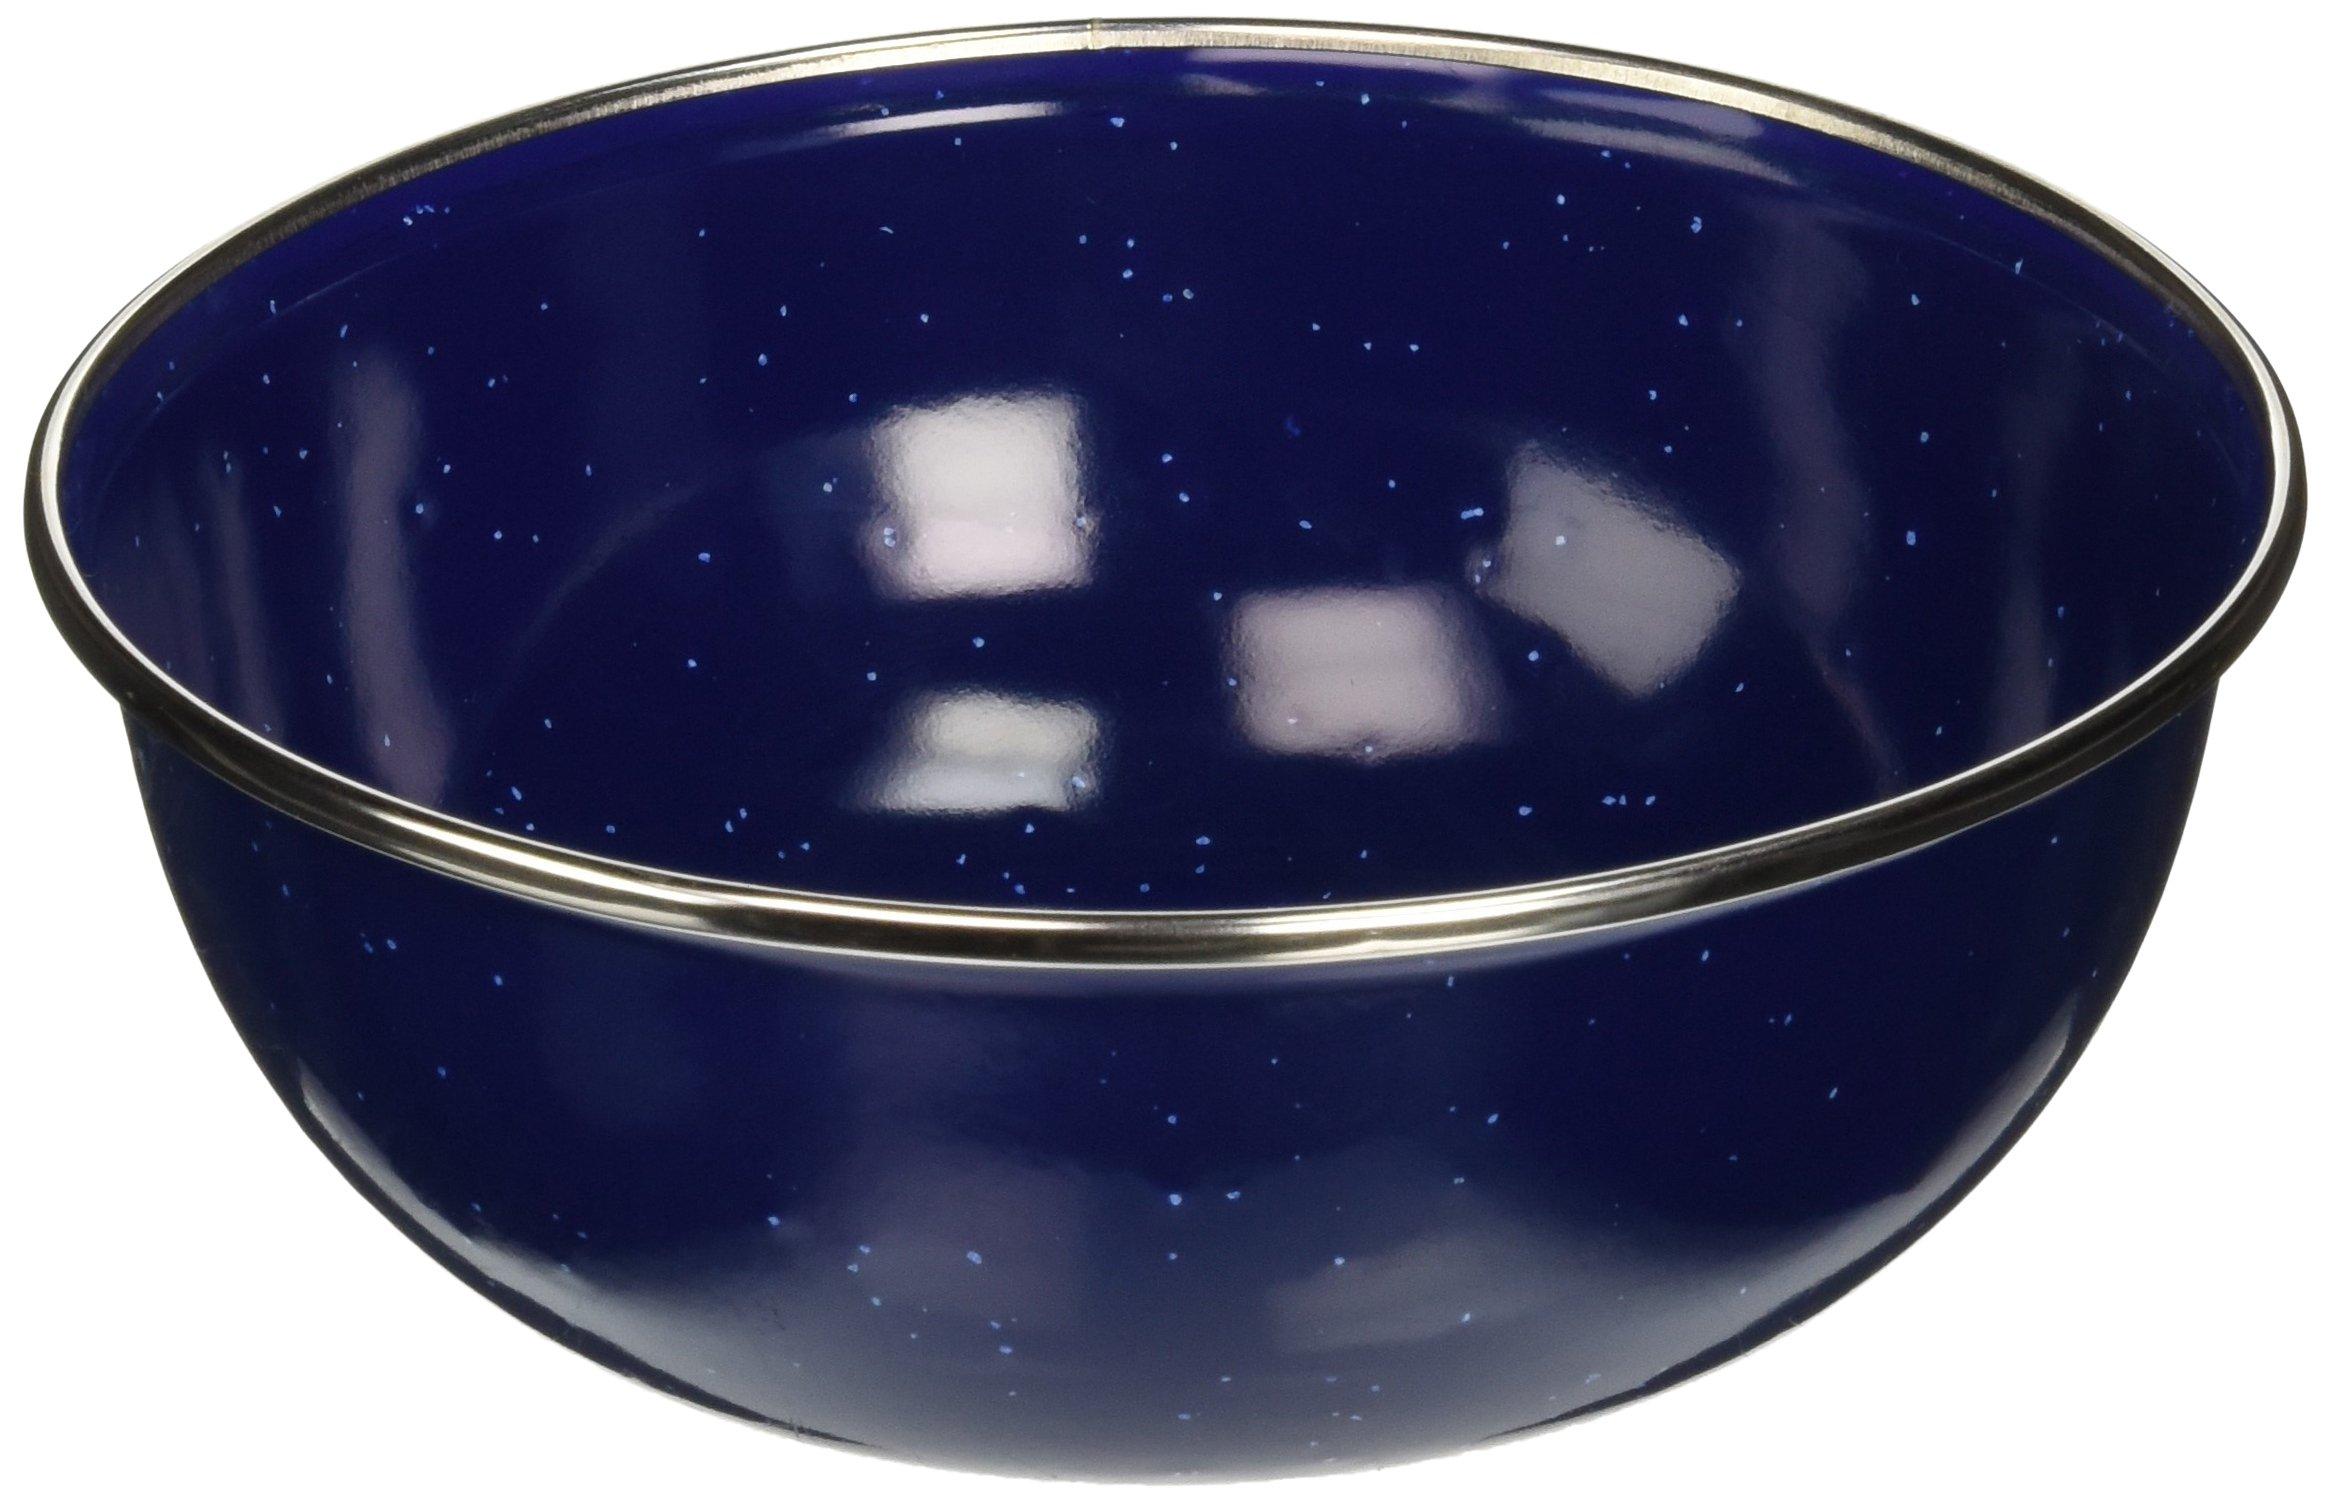 Stansport S.S. Edge Enamel Mixing Bowl, 5.75''